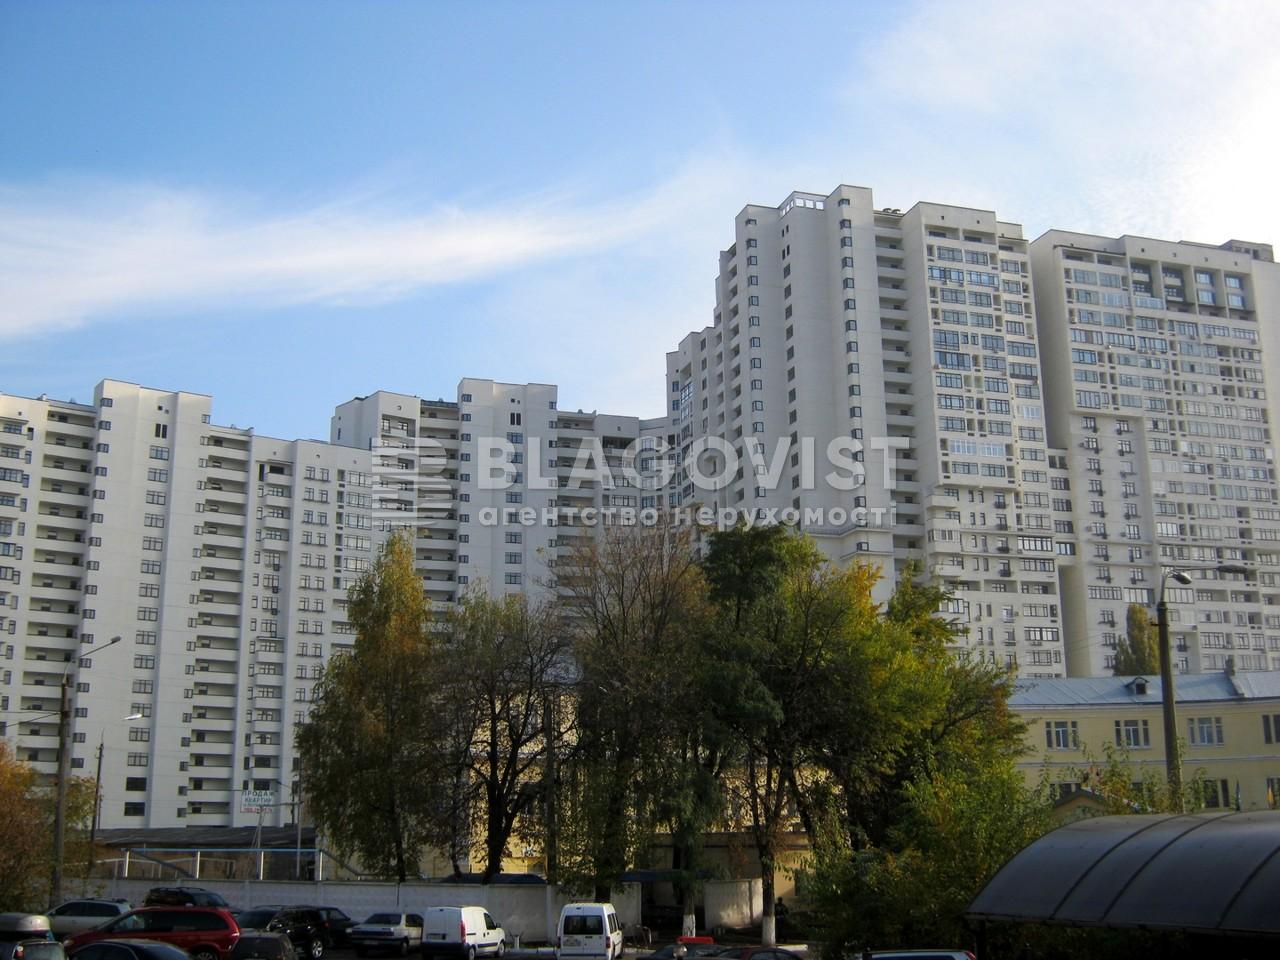 Нежитлове приміщення, D-21310, Коновальця Євгена (Щорса), Київ - Фото 2